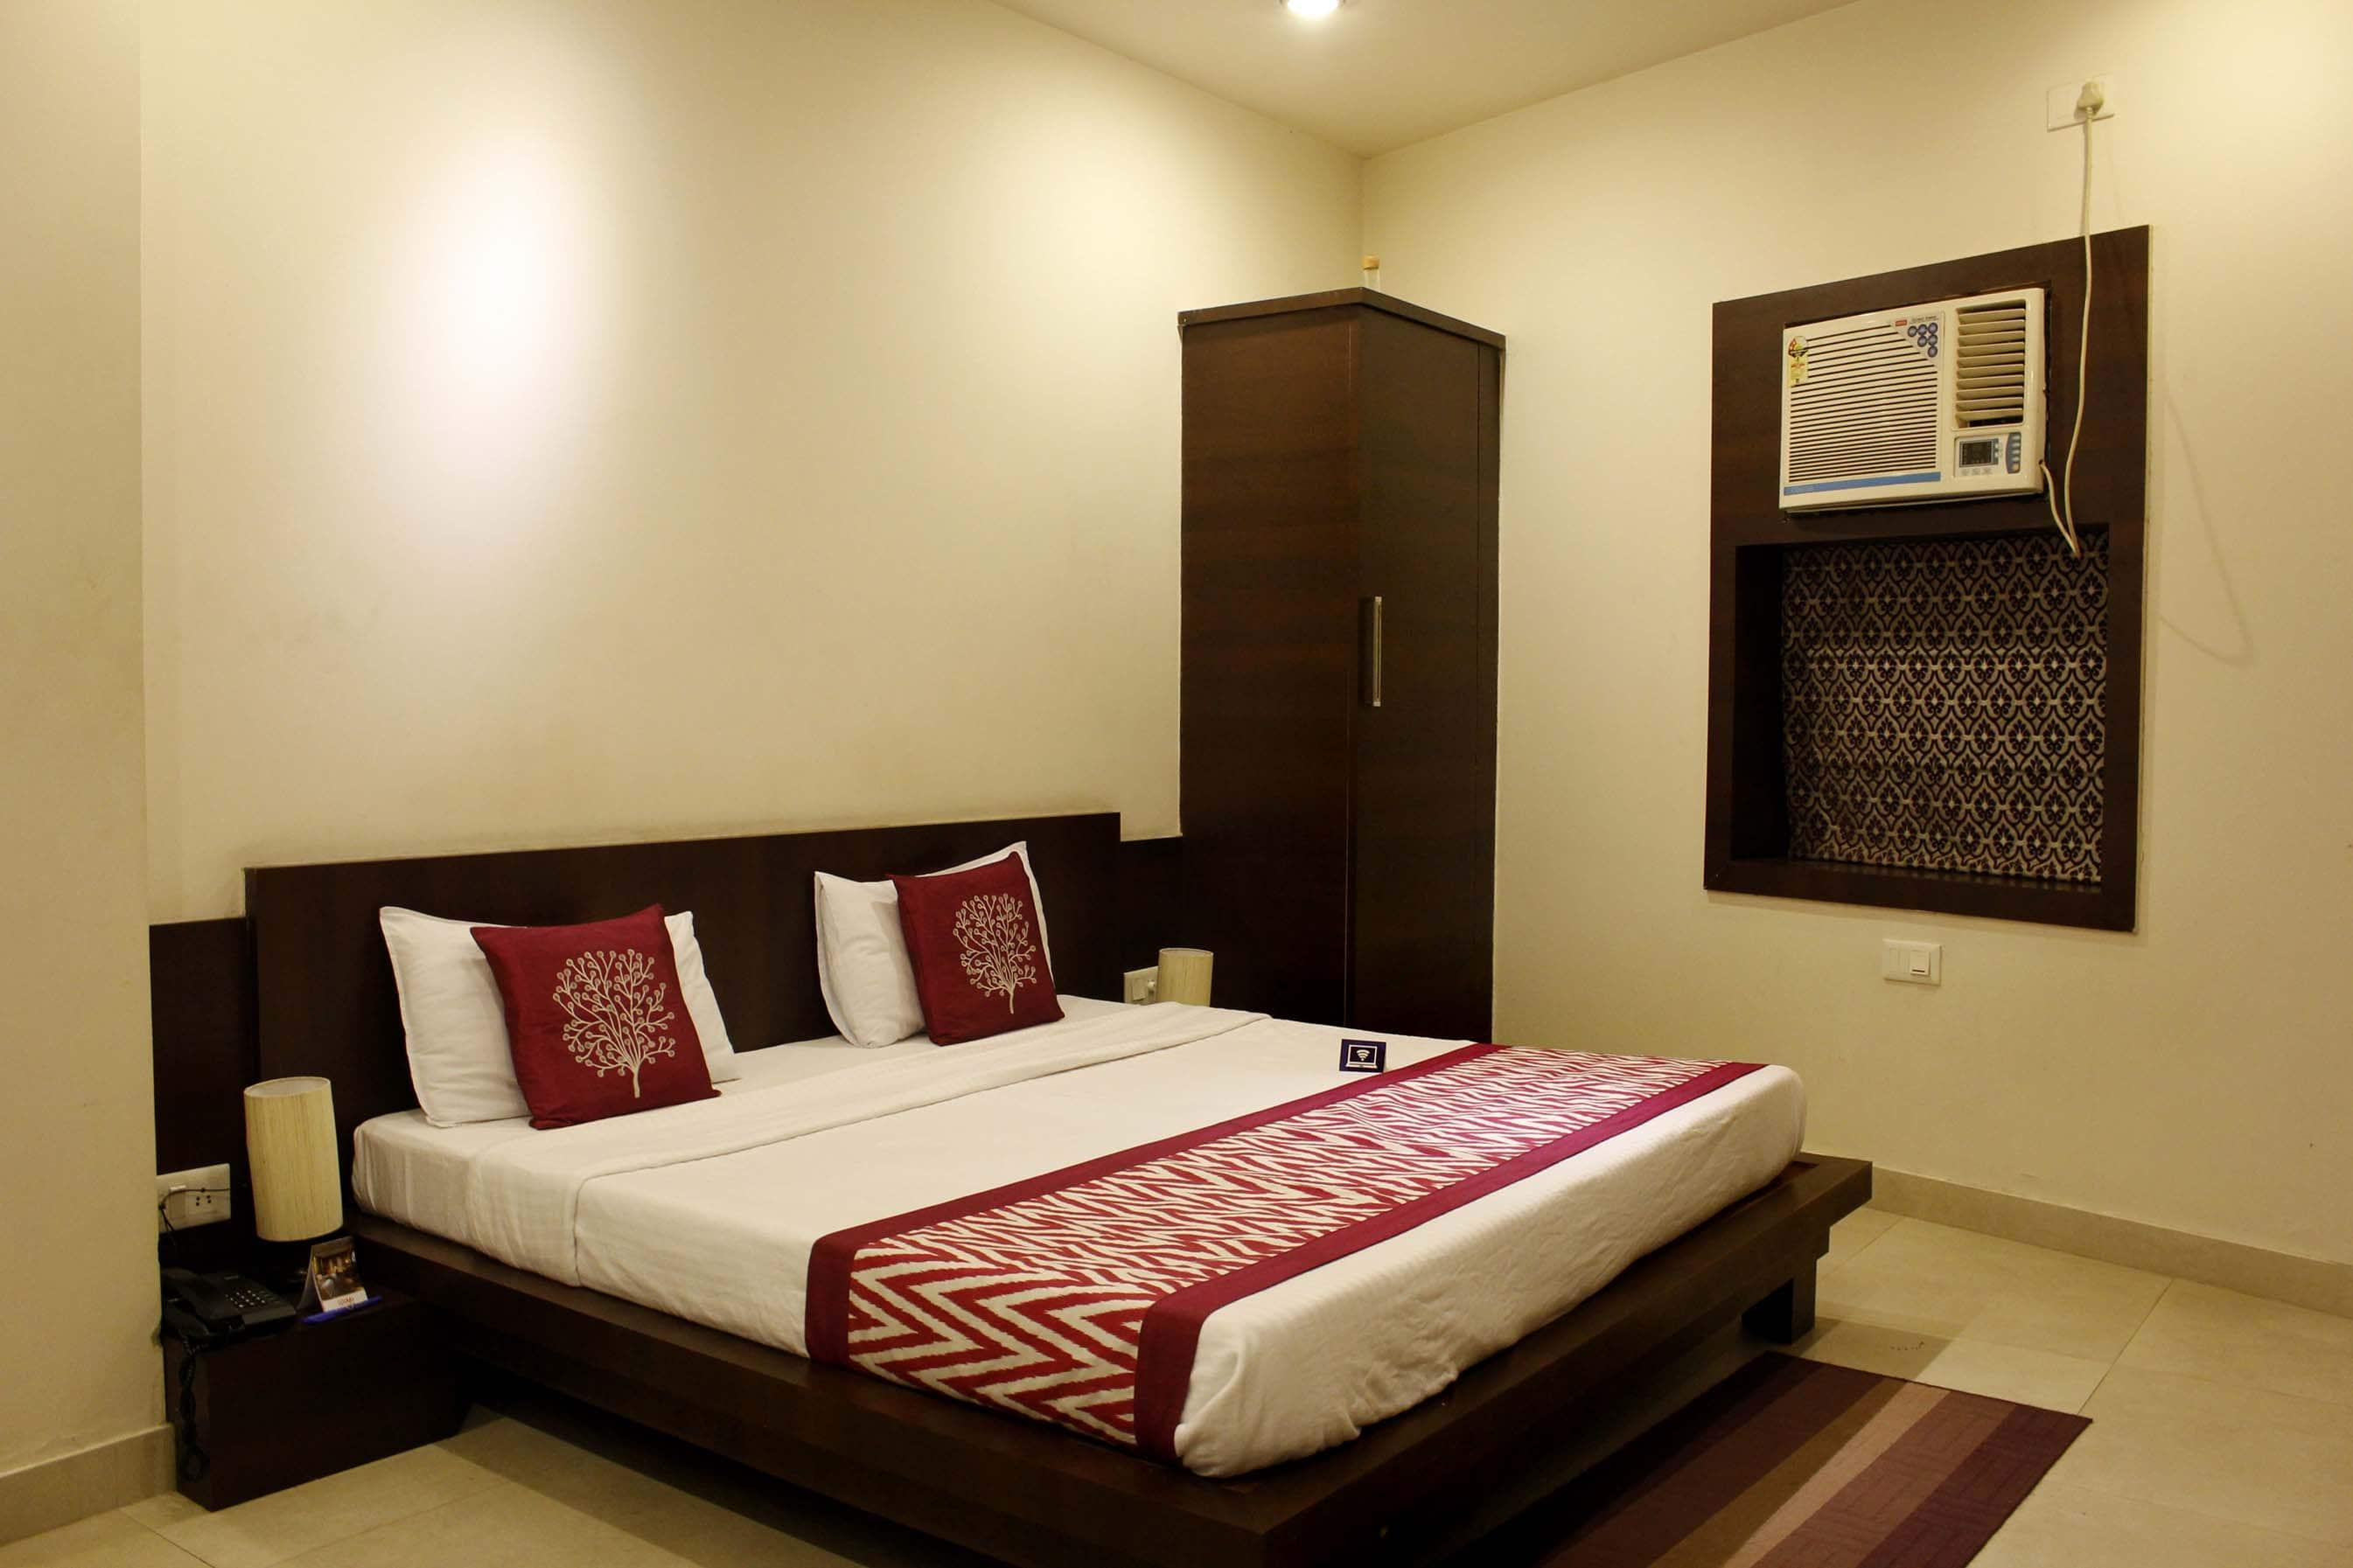 OYO 3080 Doorkey Hotel in Hisar